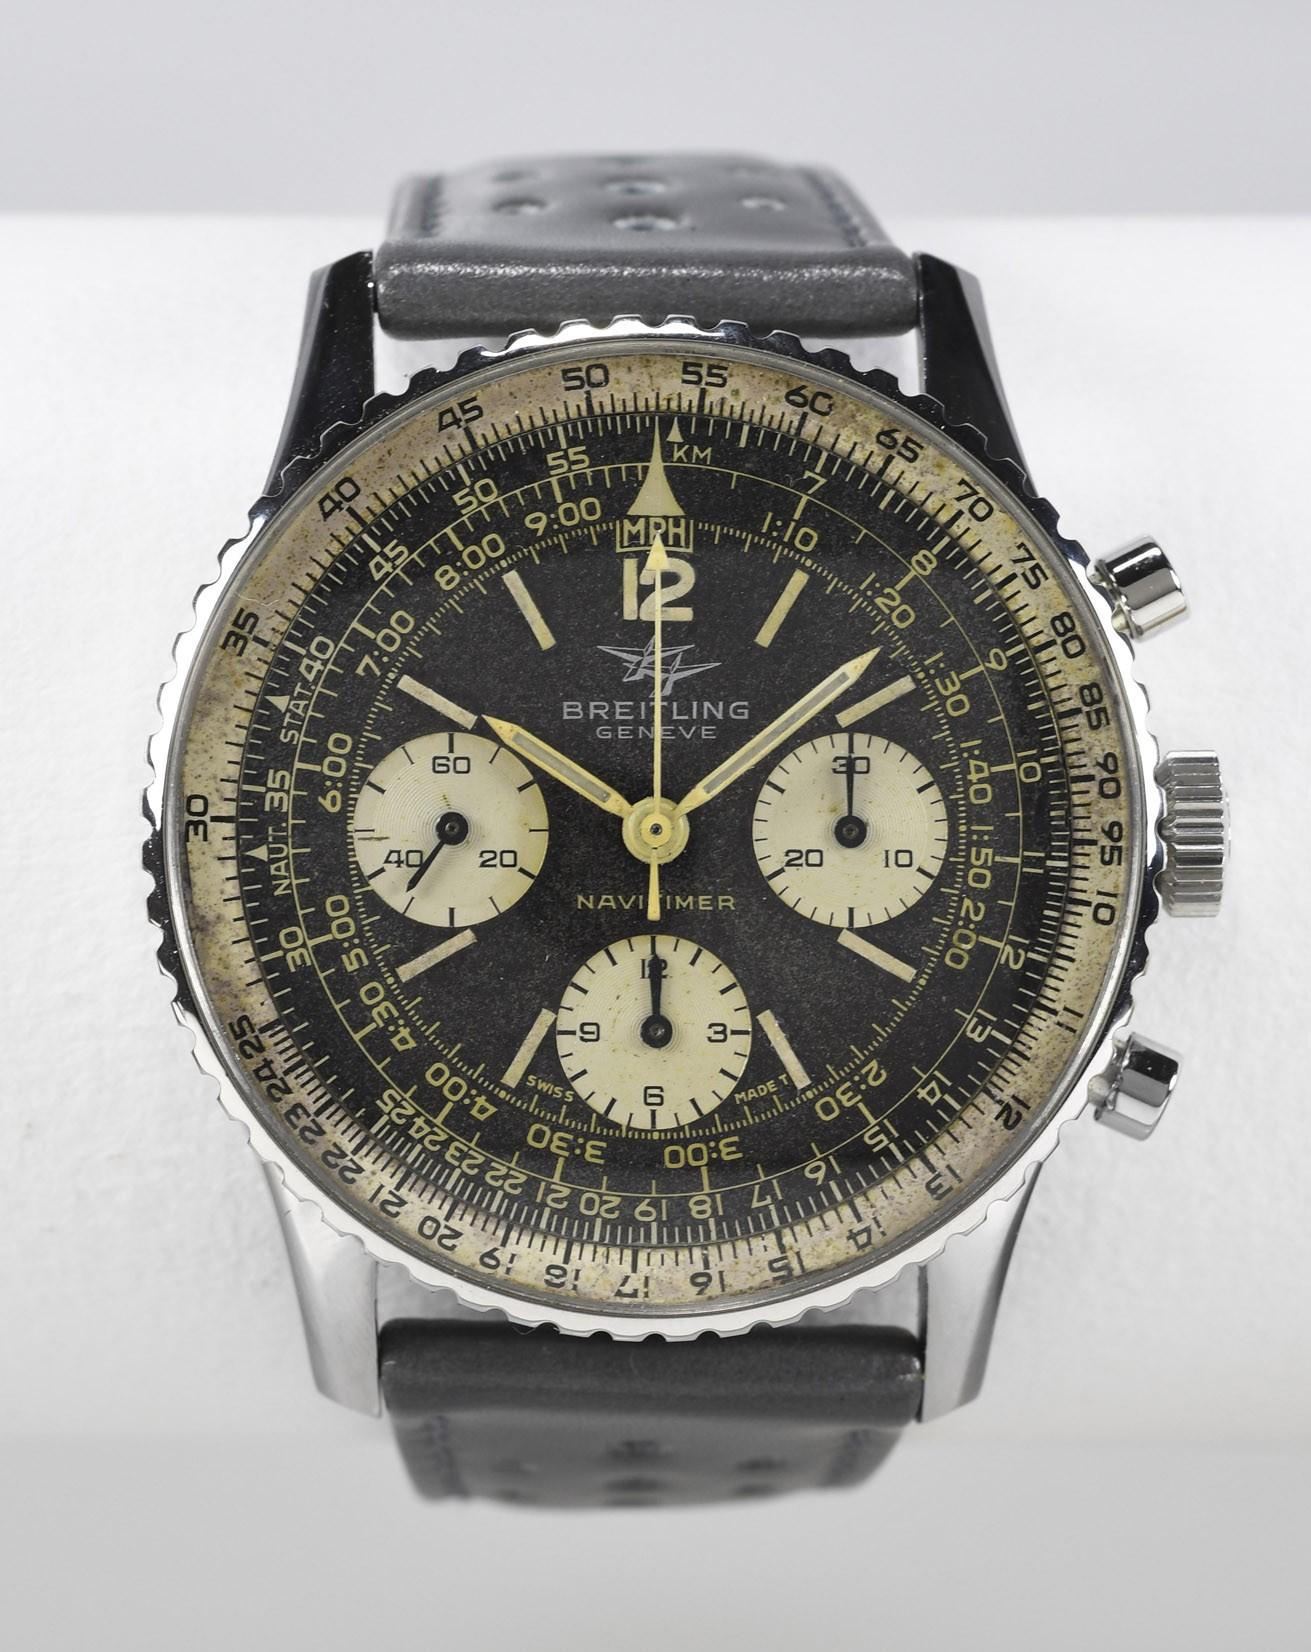 Breitling Chronographe Navitimer Ref 806 Vers 1966 Vintage Watch Story